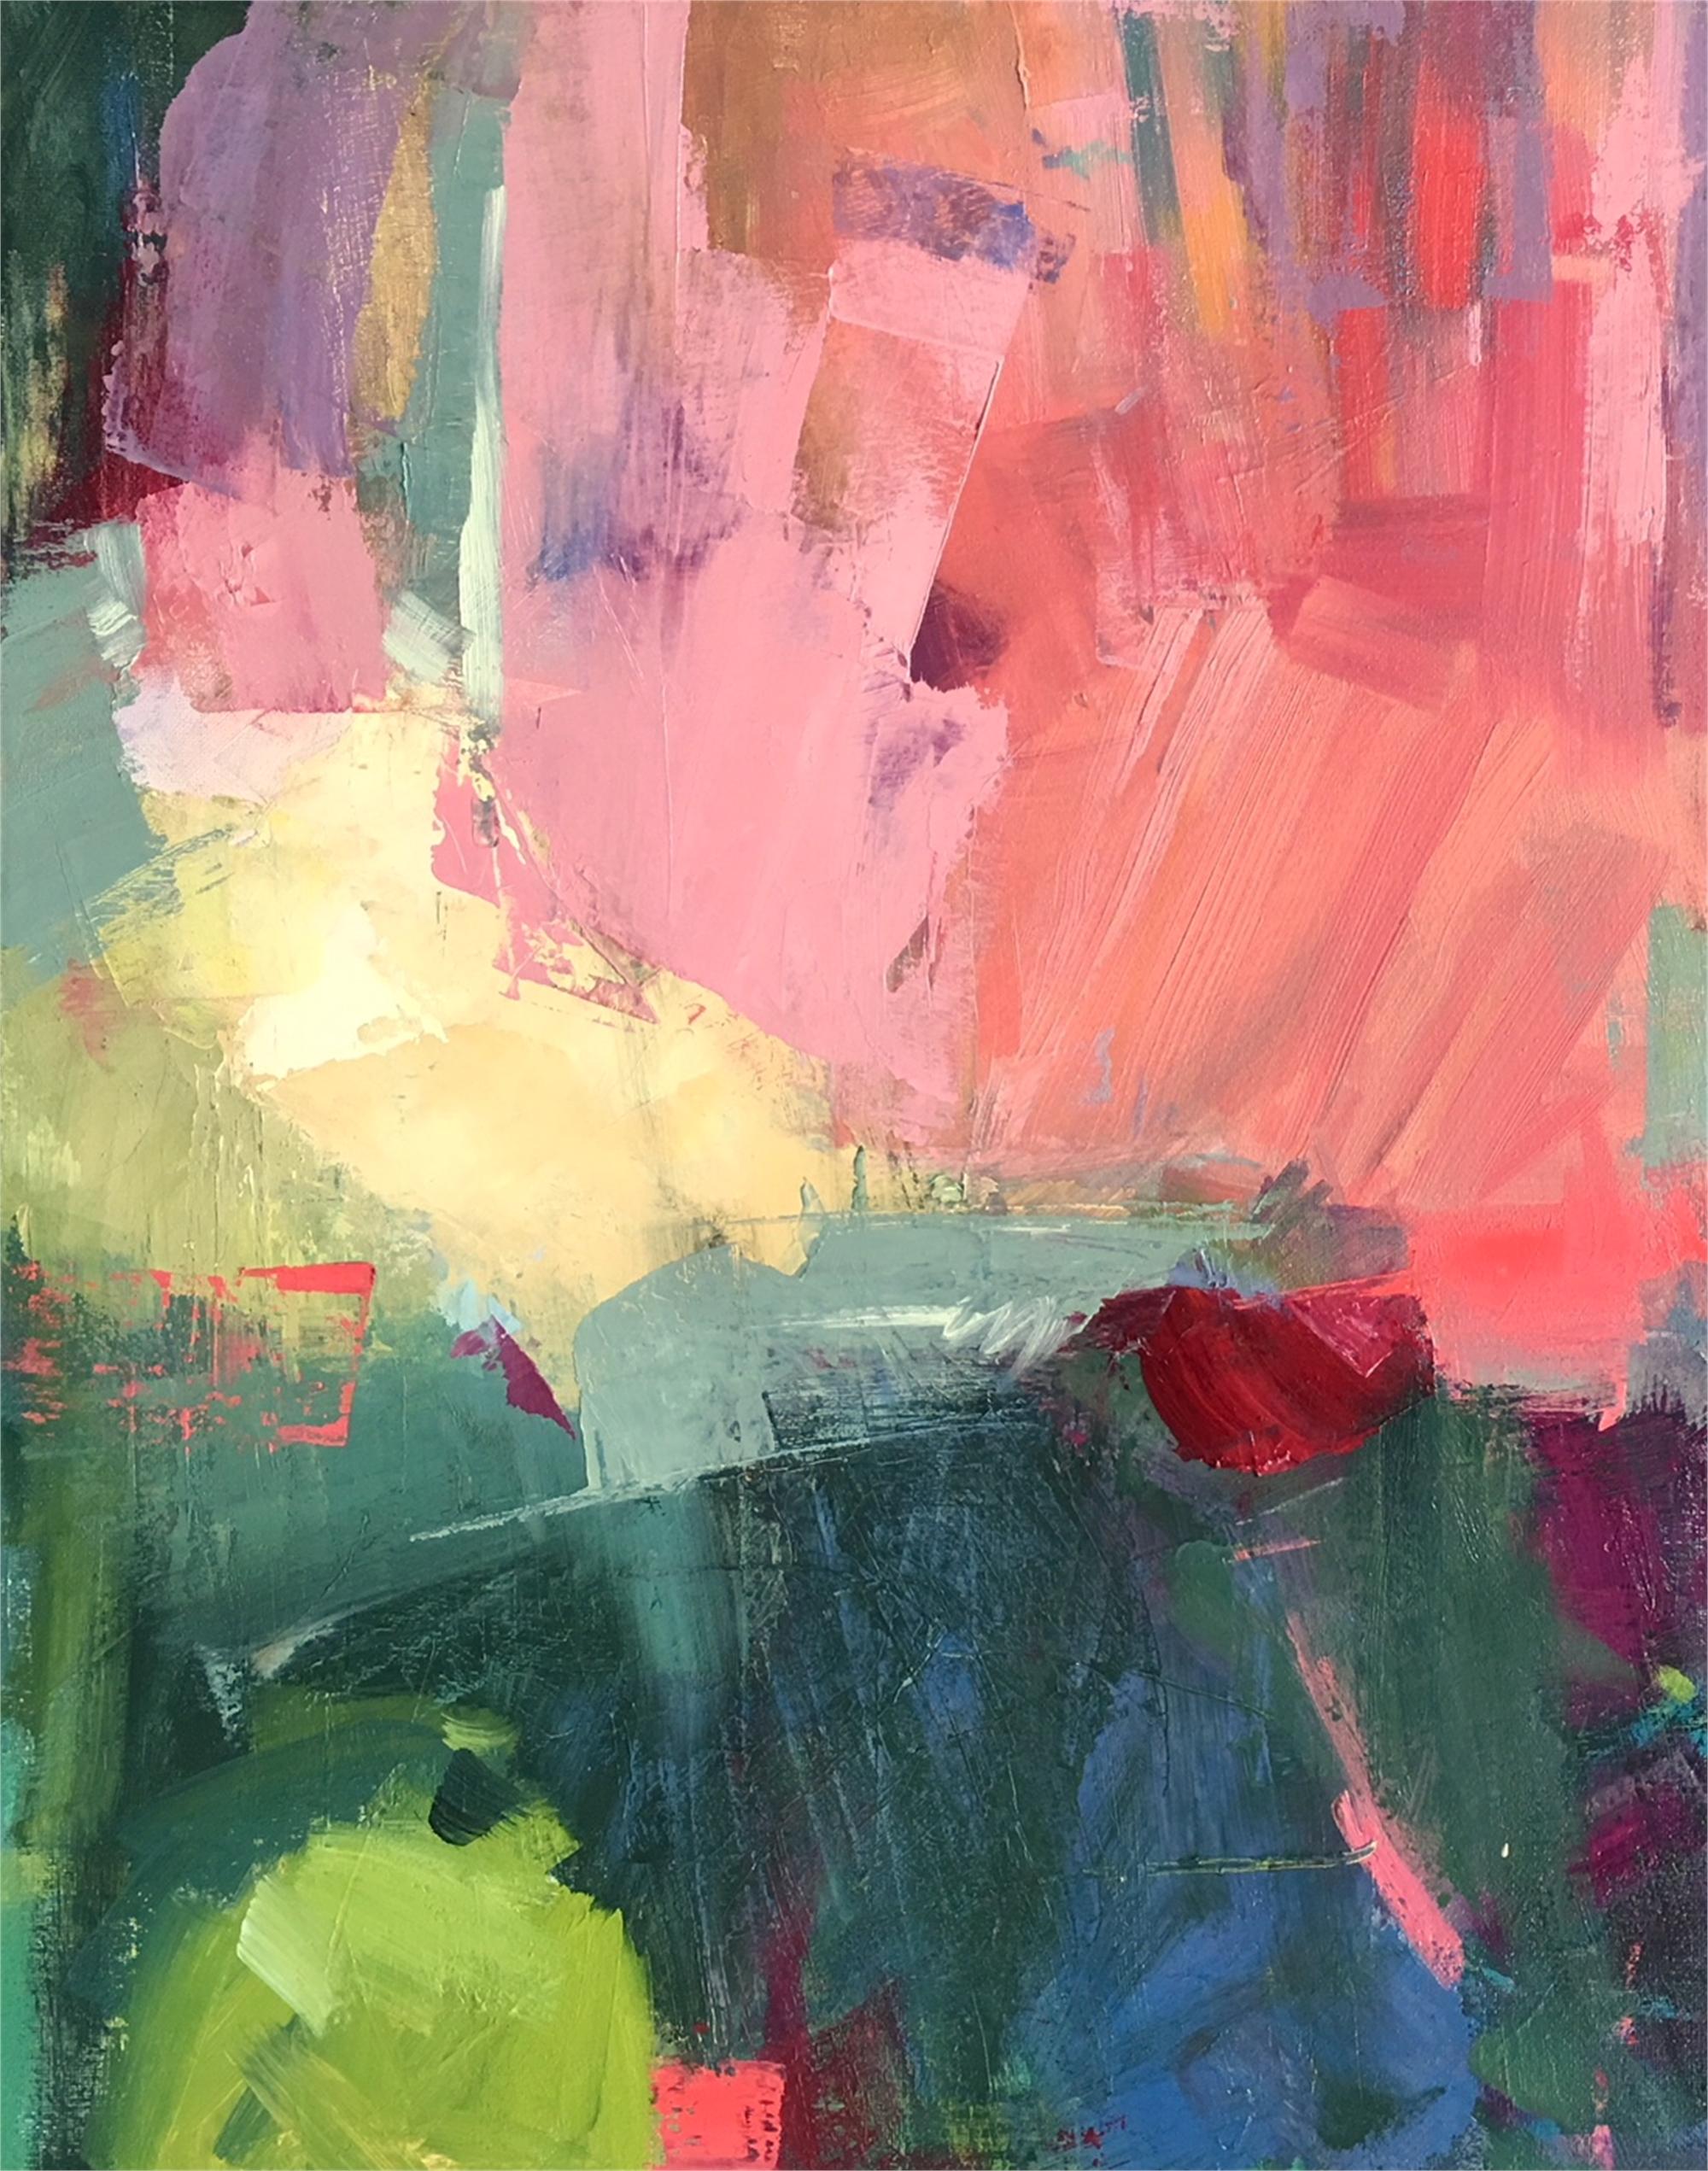 Volcanic Bloom by Marissa Vogl